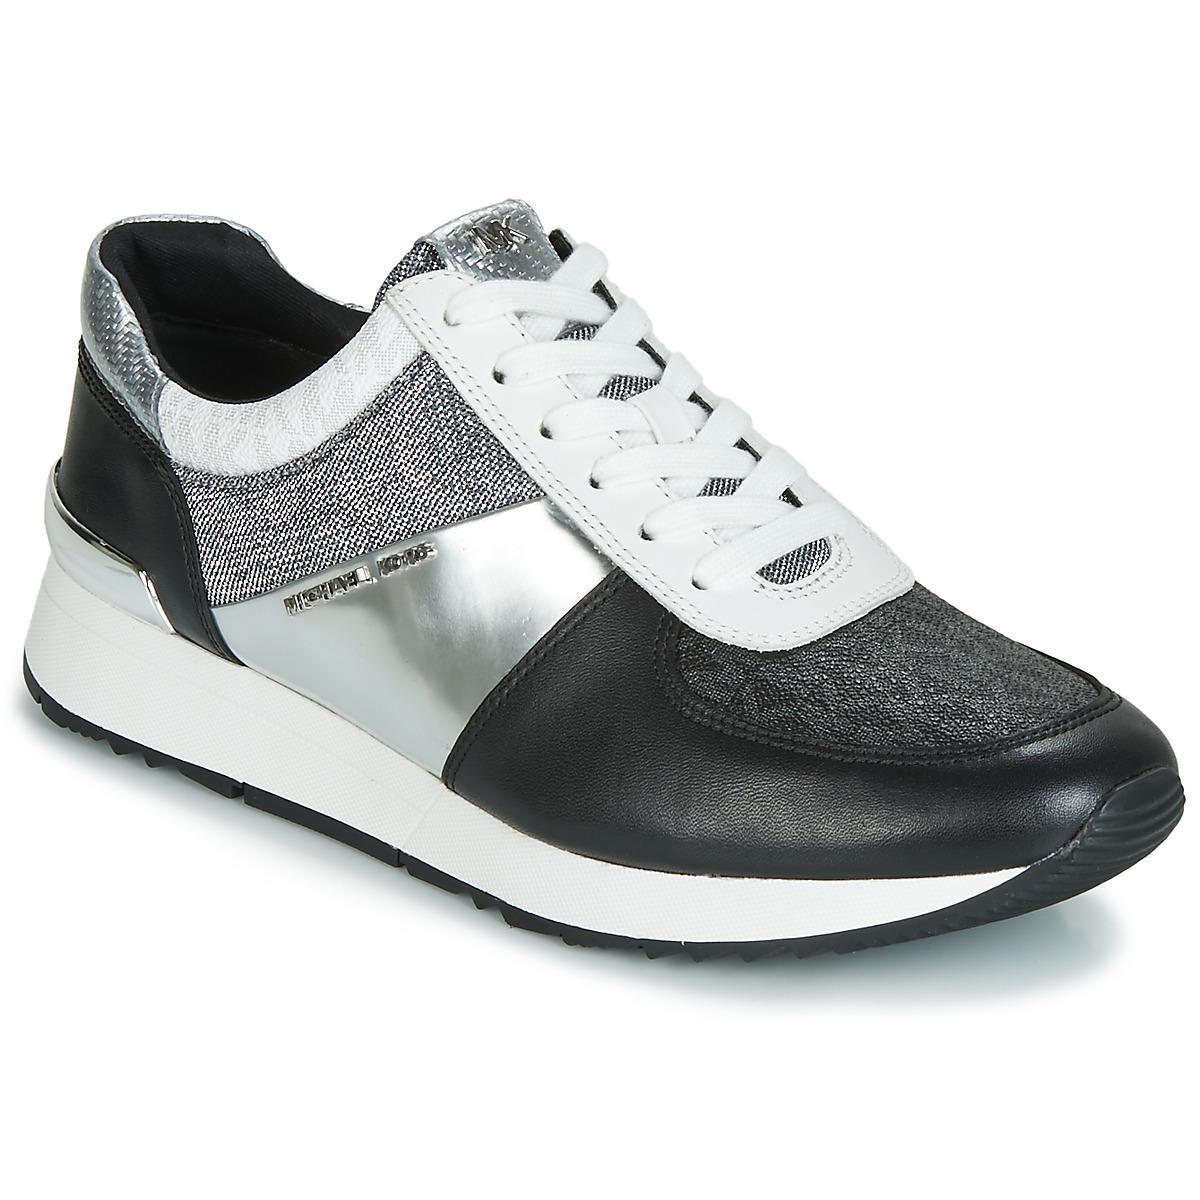 f8efbd6bd51f3 MICHAEL Michael Kors Allie Trainer Women s Shoes (trainers) In Black ...